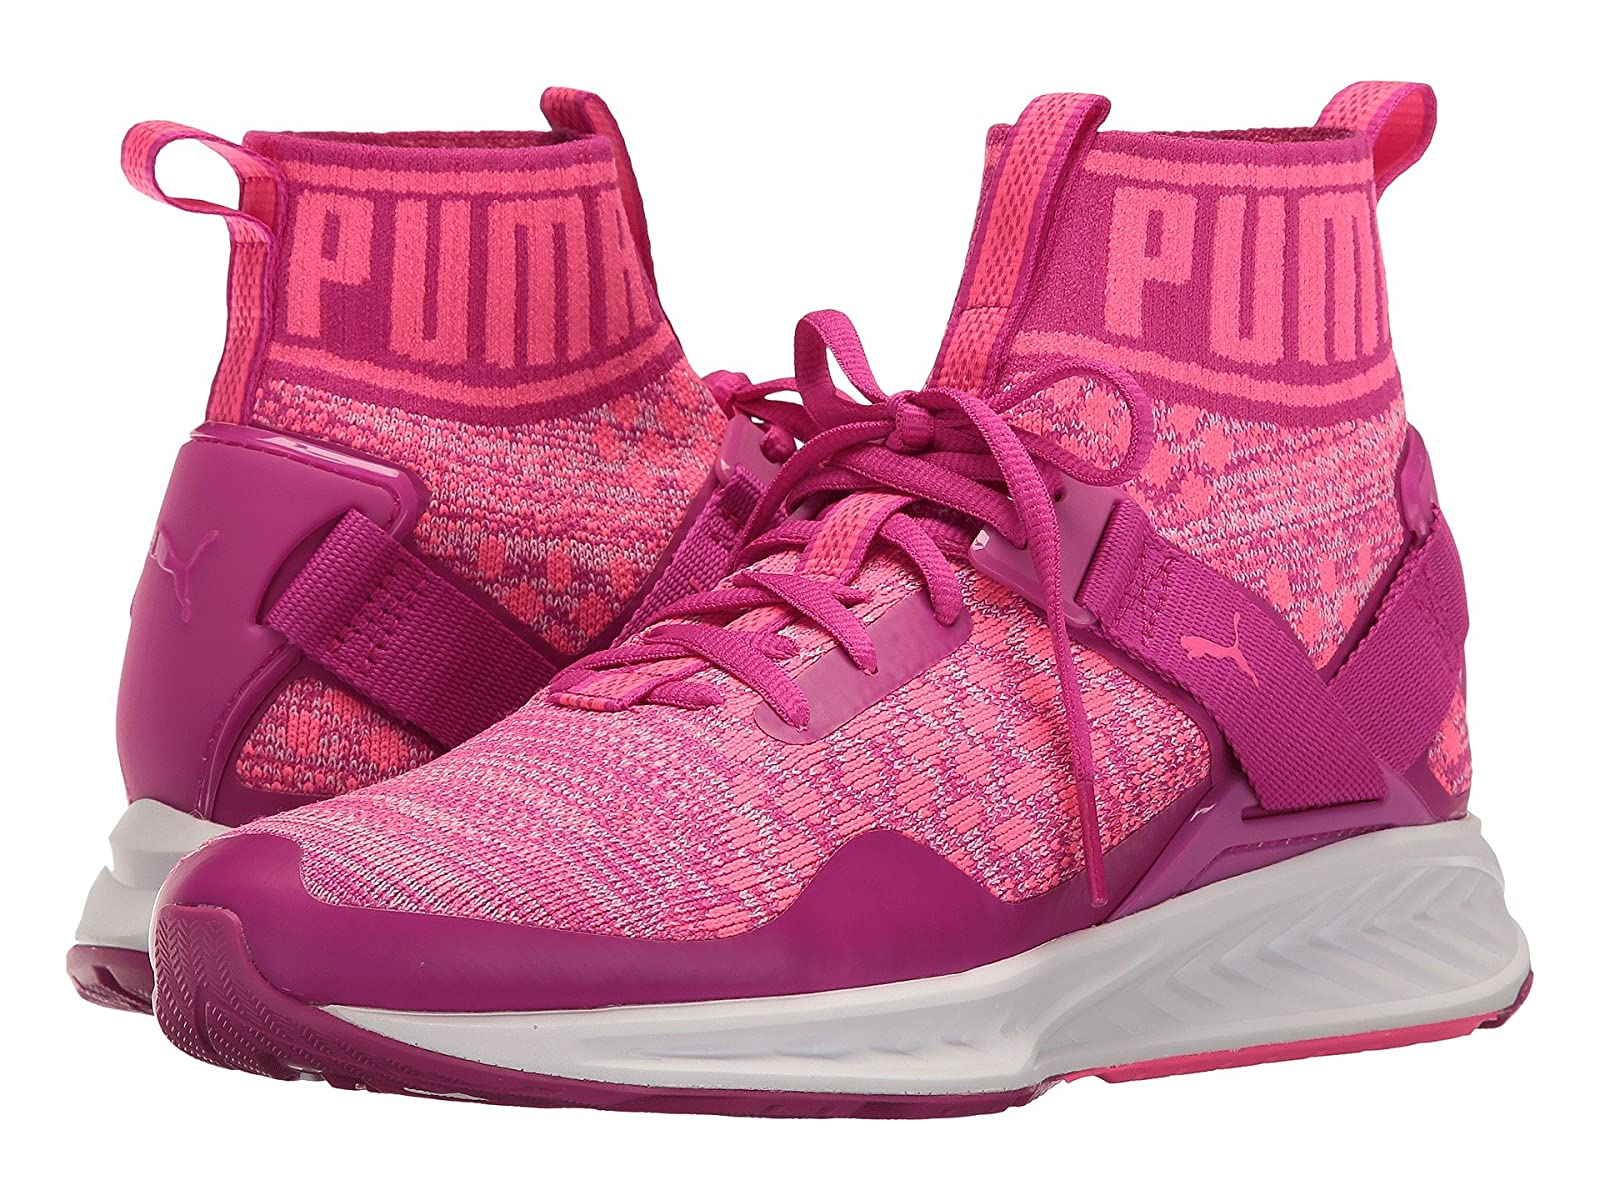 Puma Kids Ignite Evoknit Jr (Big Kid)Cheap and distinctive eye-catching shoes